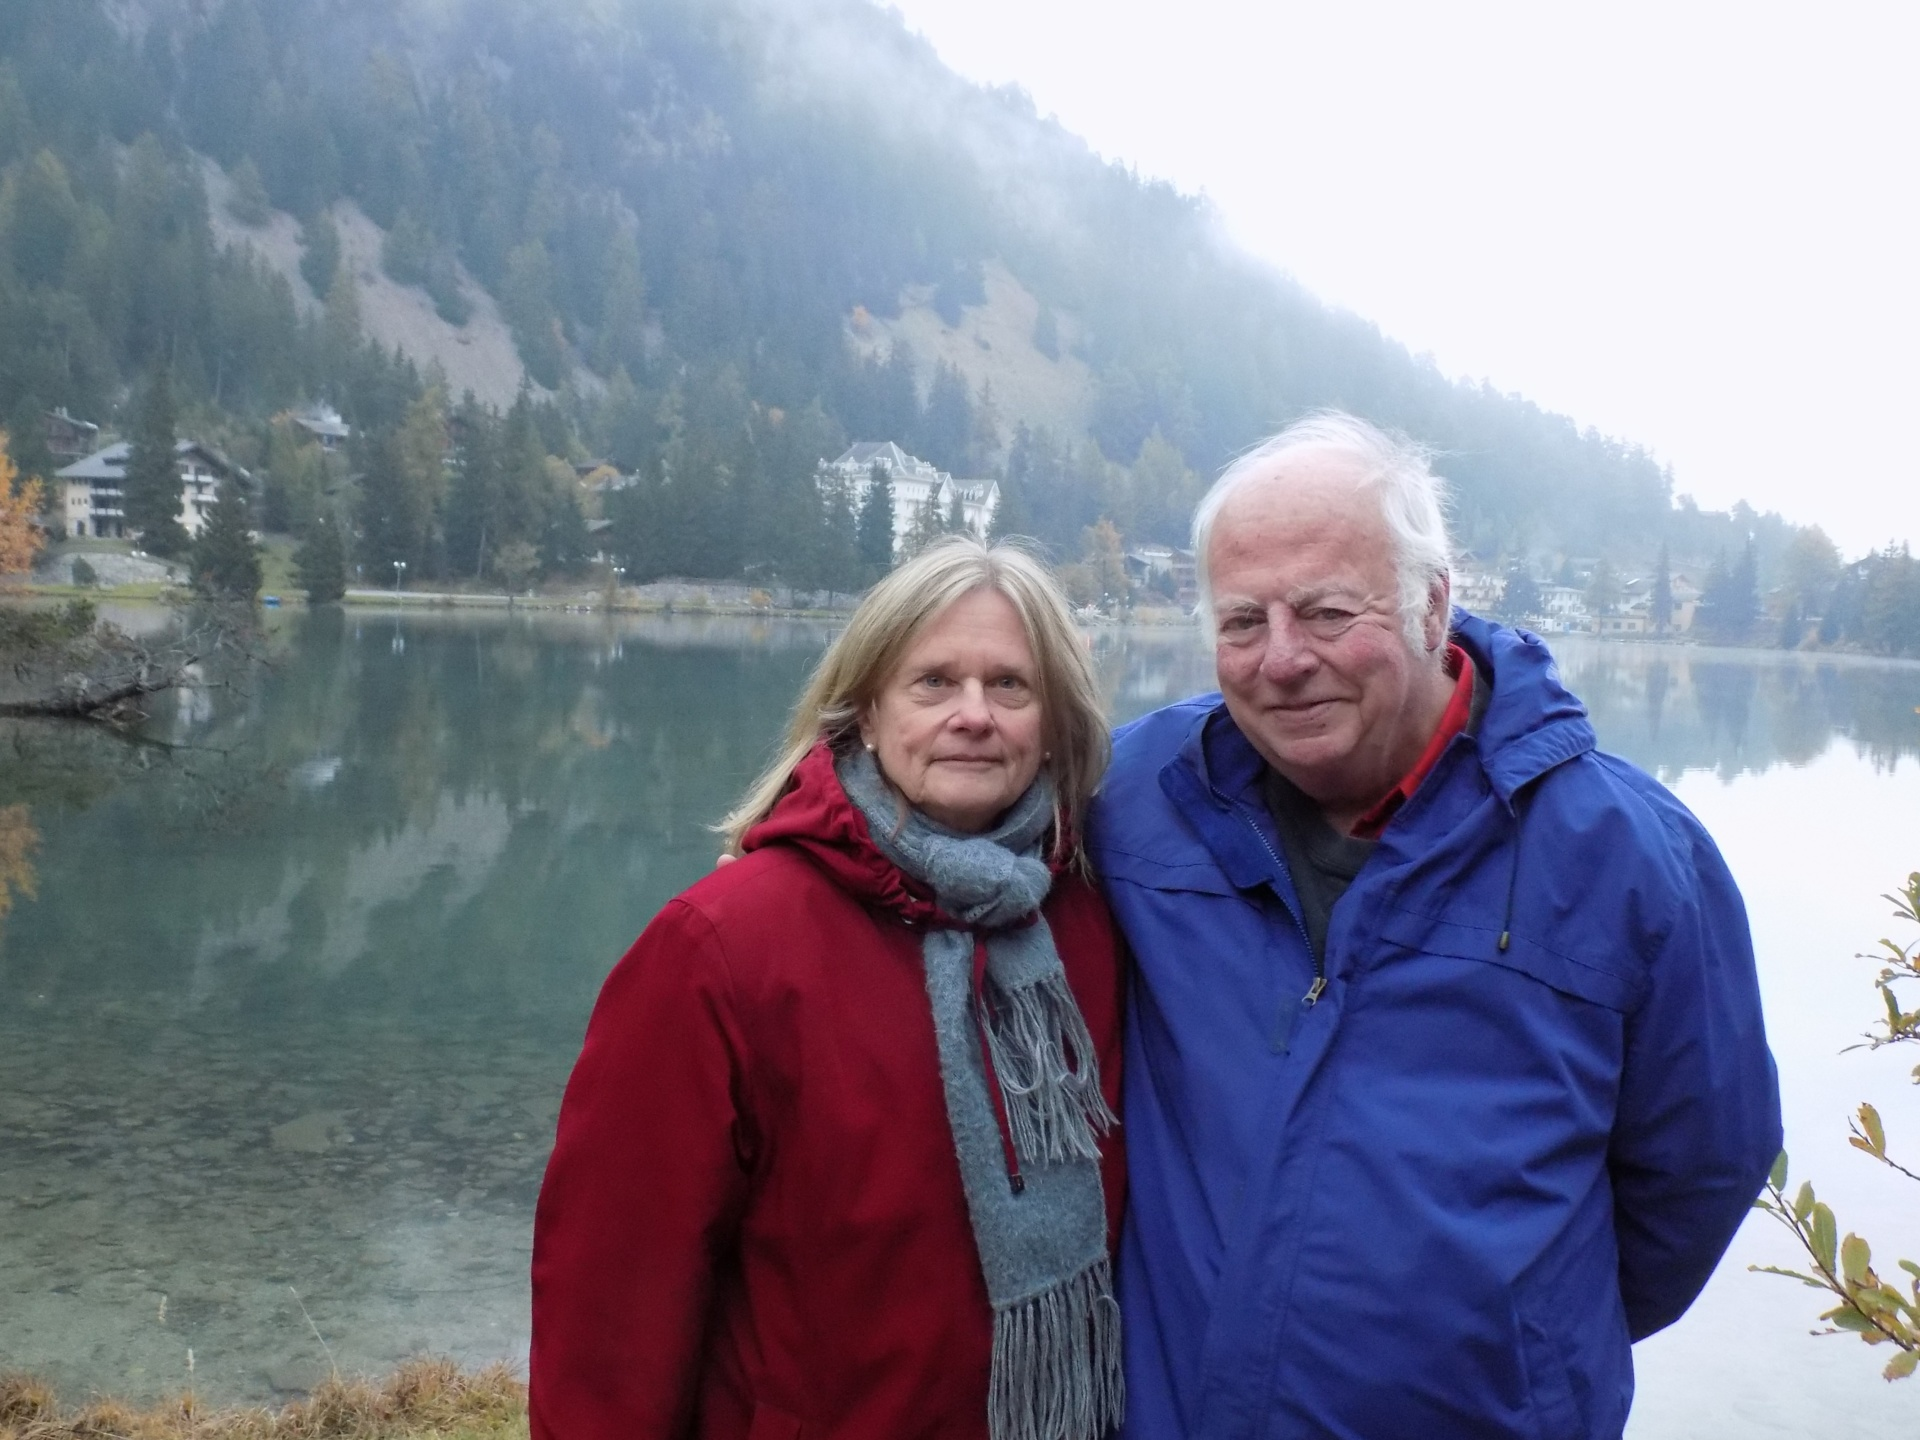 In Memoriam of Charles Van Doren: An Appreciation of Our Moderator - a Master Teacher